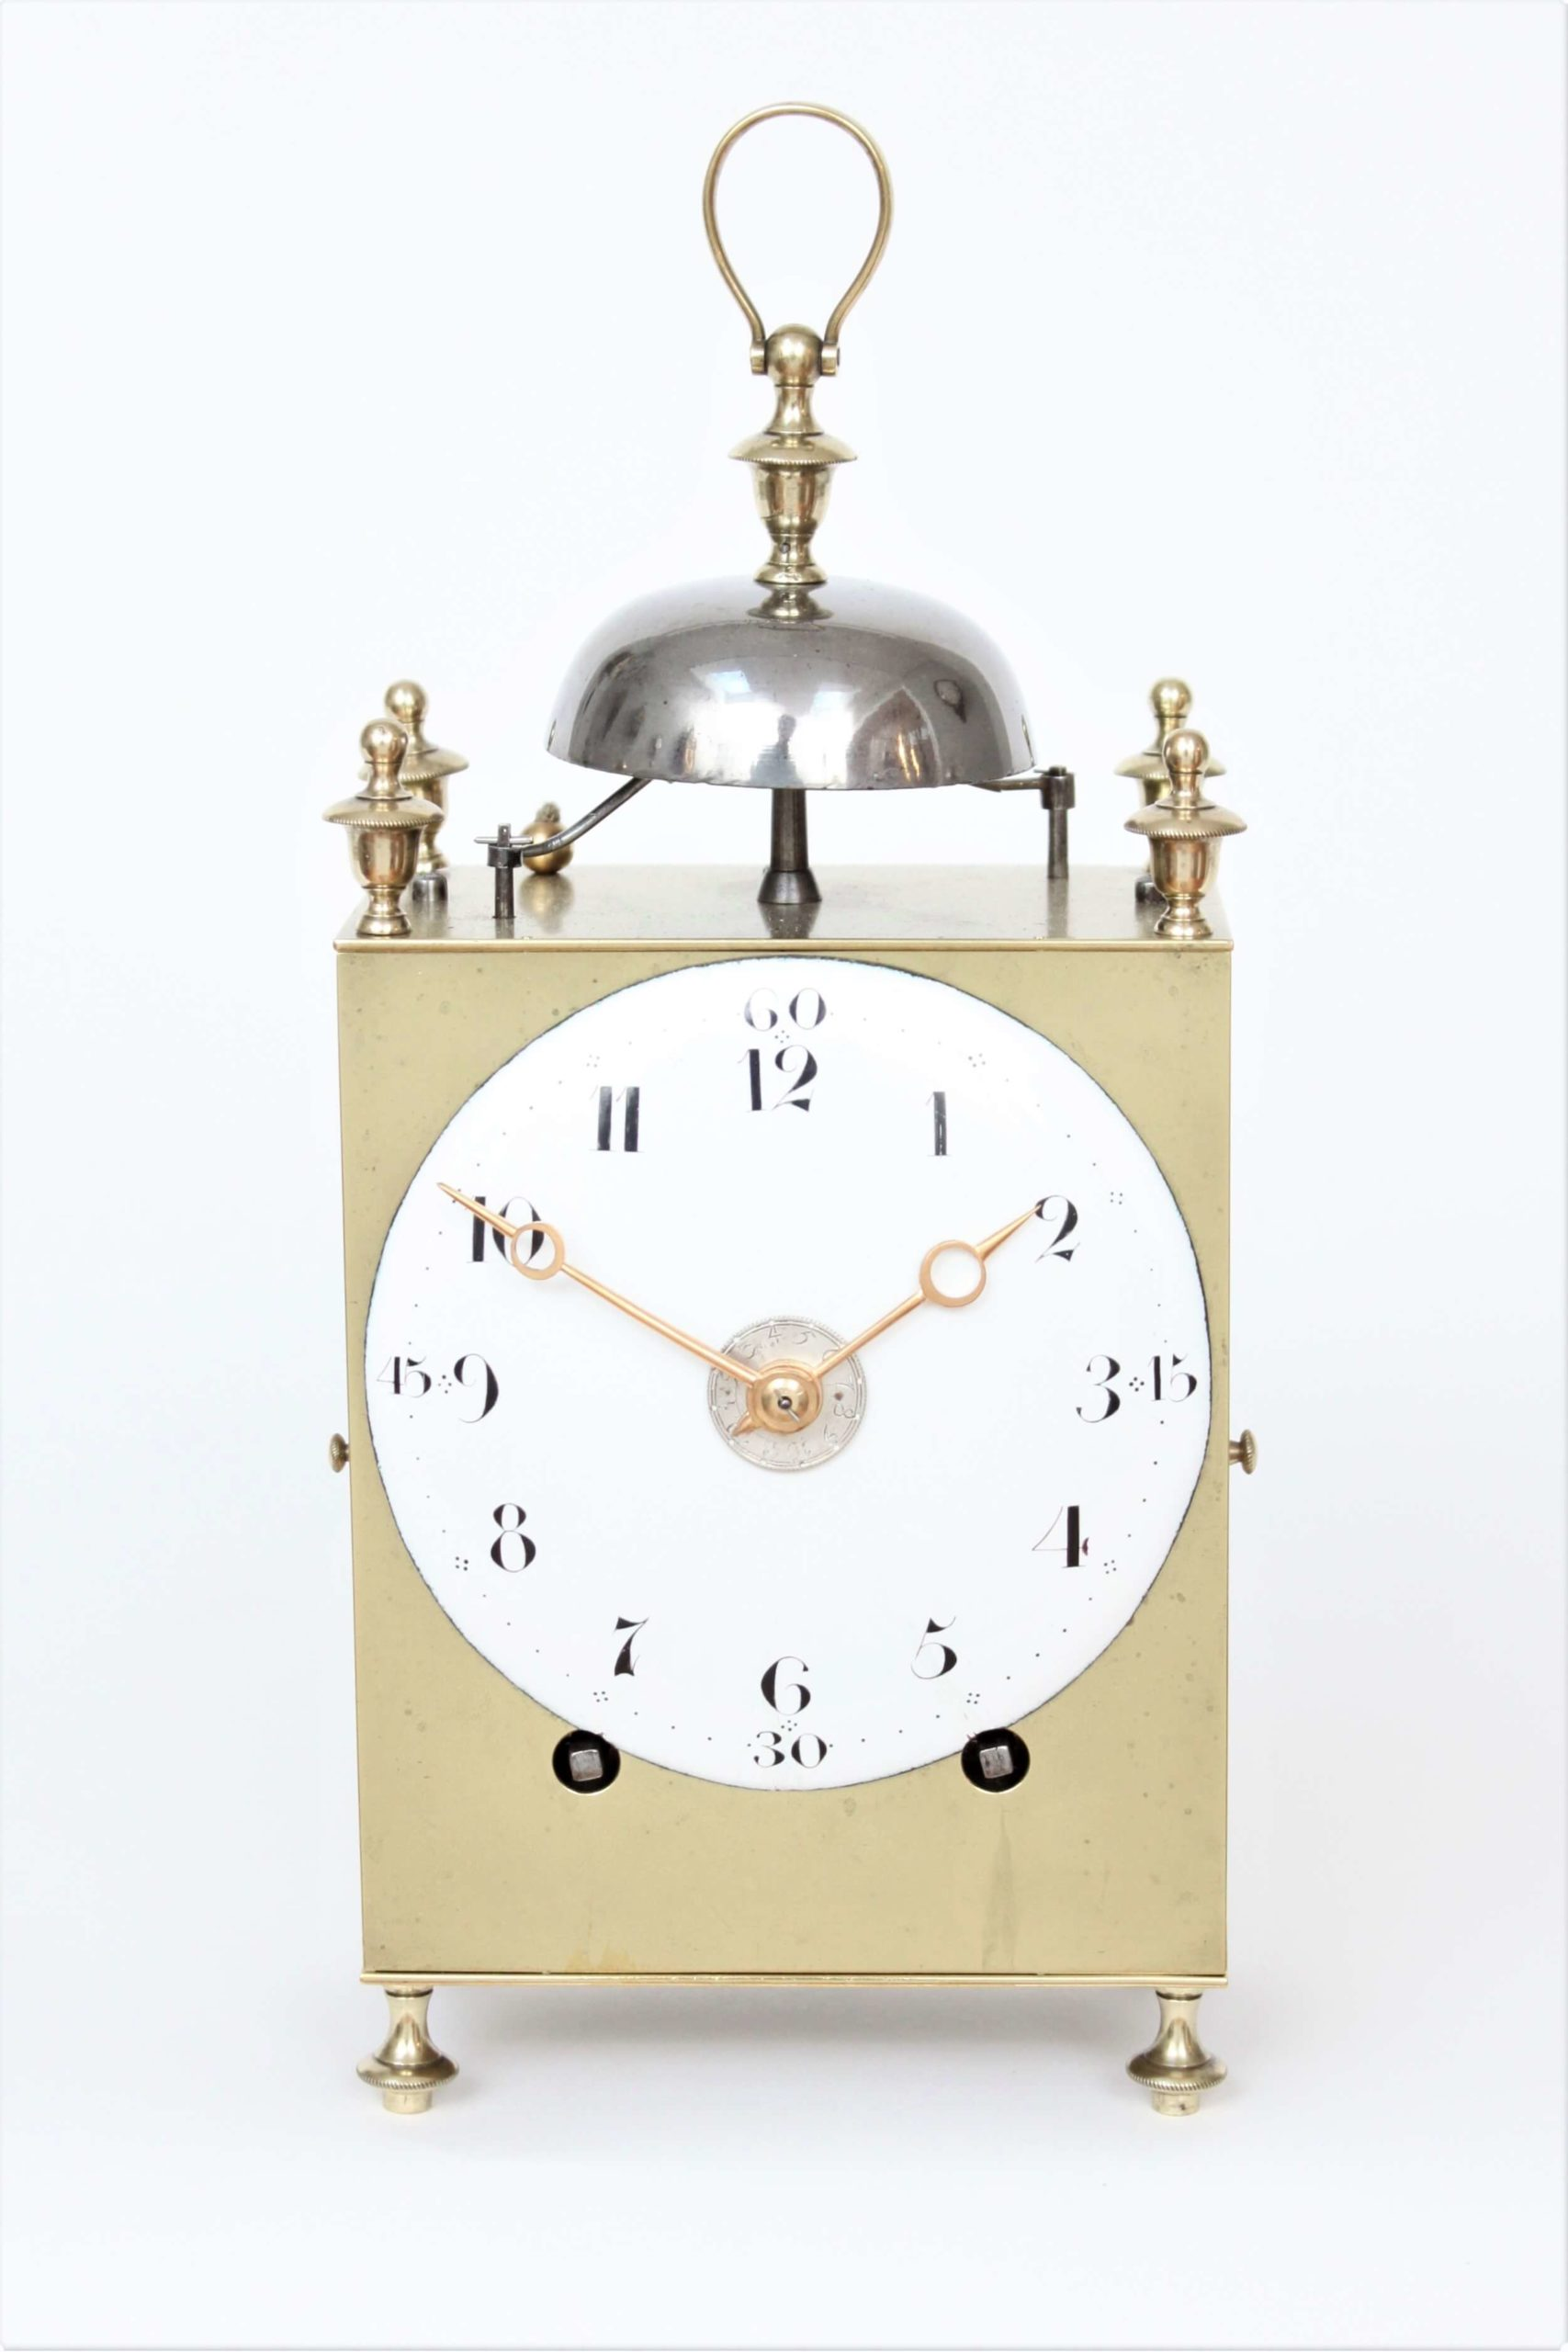 Swiss-brass-striking-repeating-antique-travel-capucine-chaux De Fonds-clock-timepiece-10